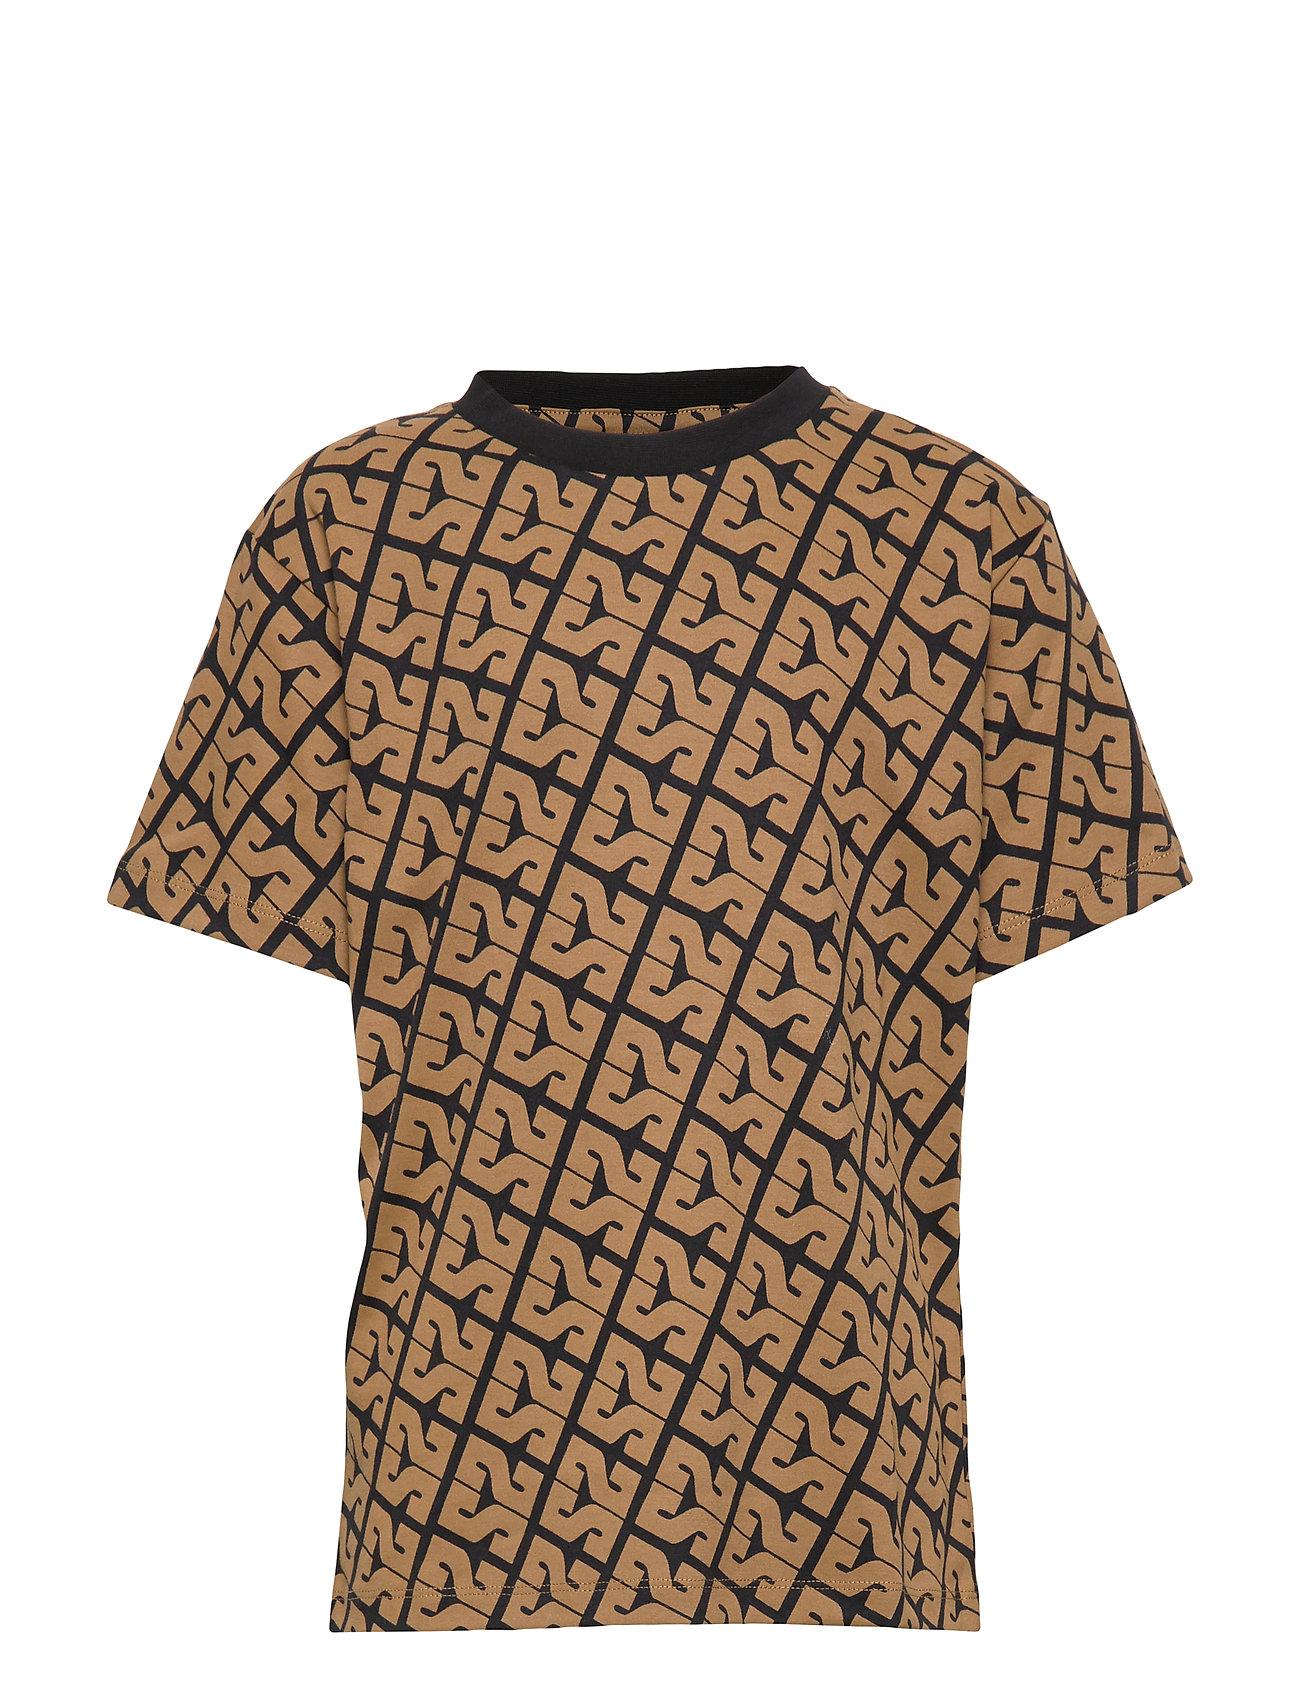 Petit by Sofie Schnoor T-shirt - TAN